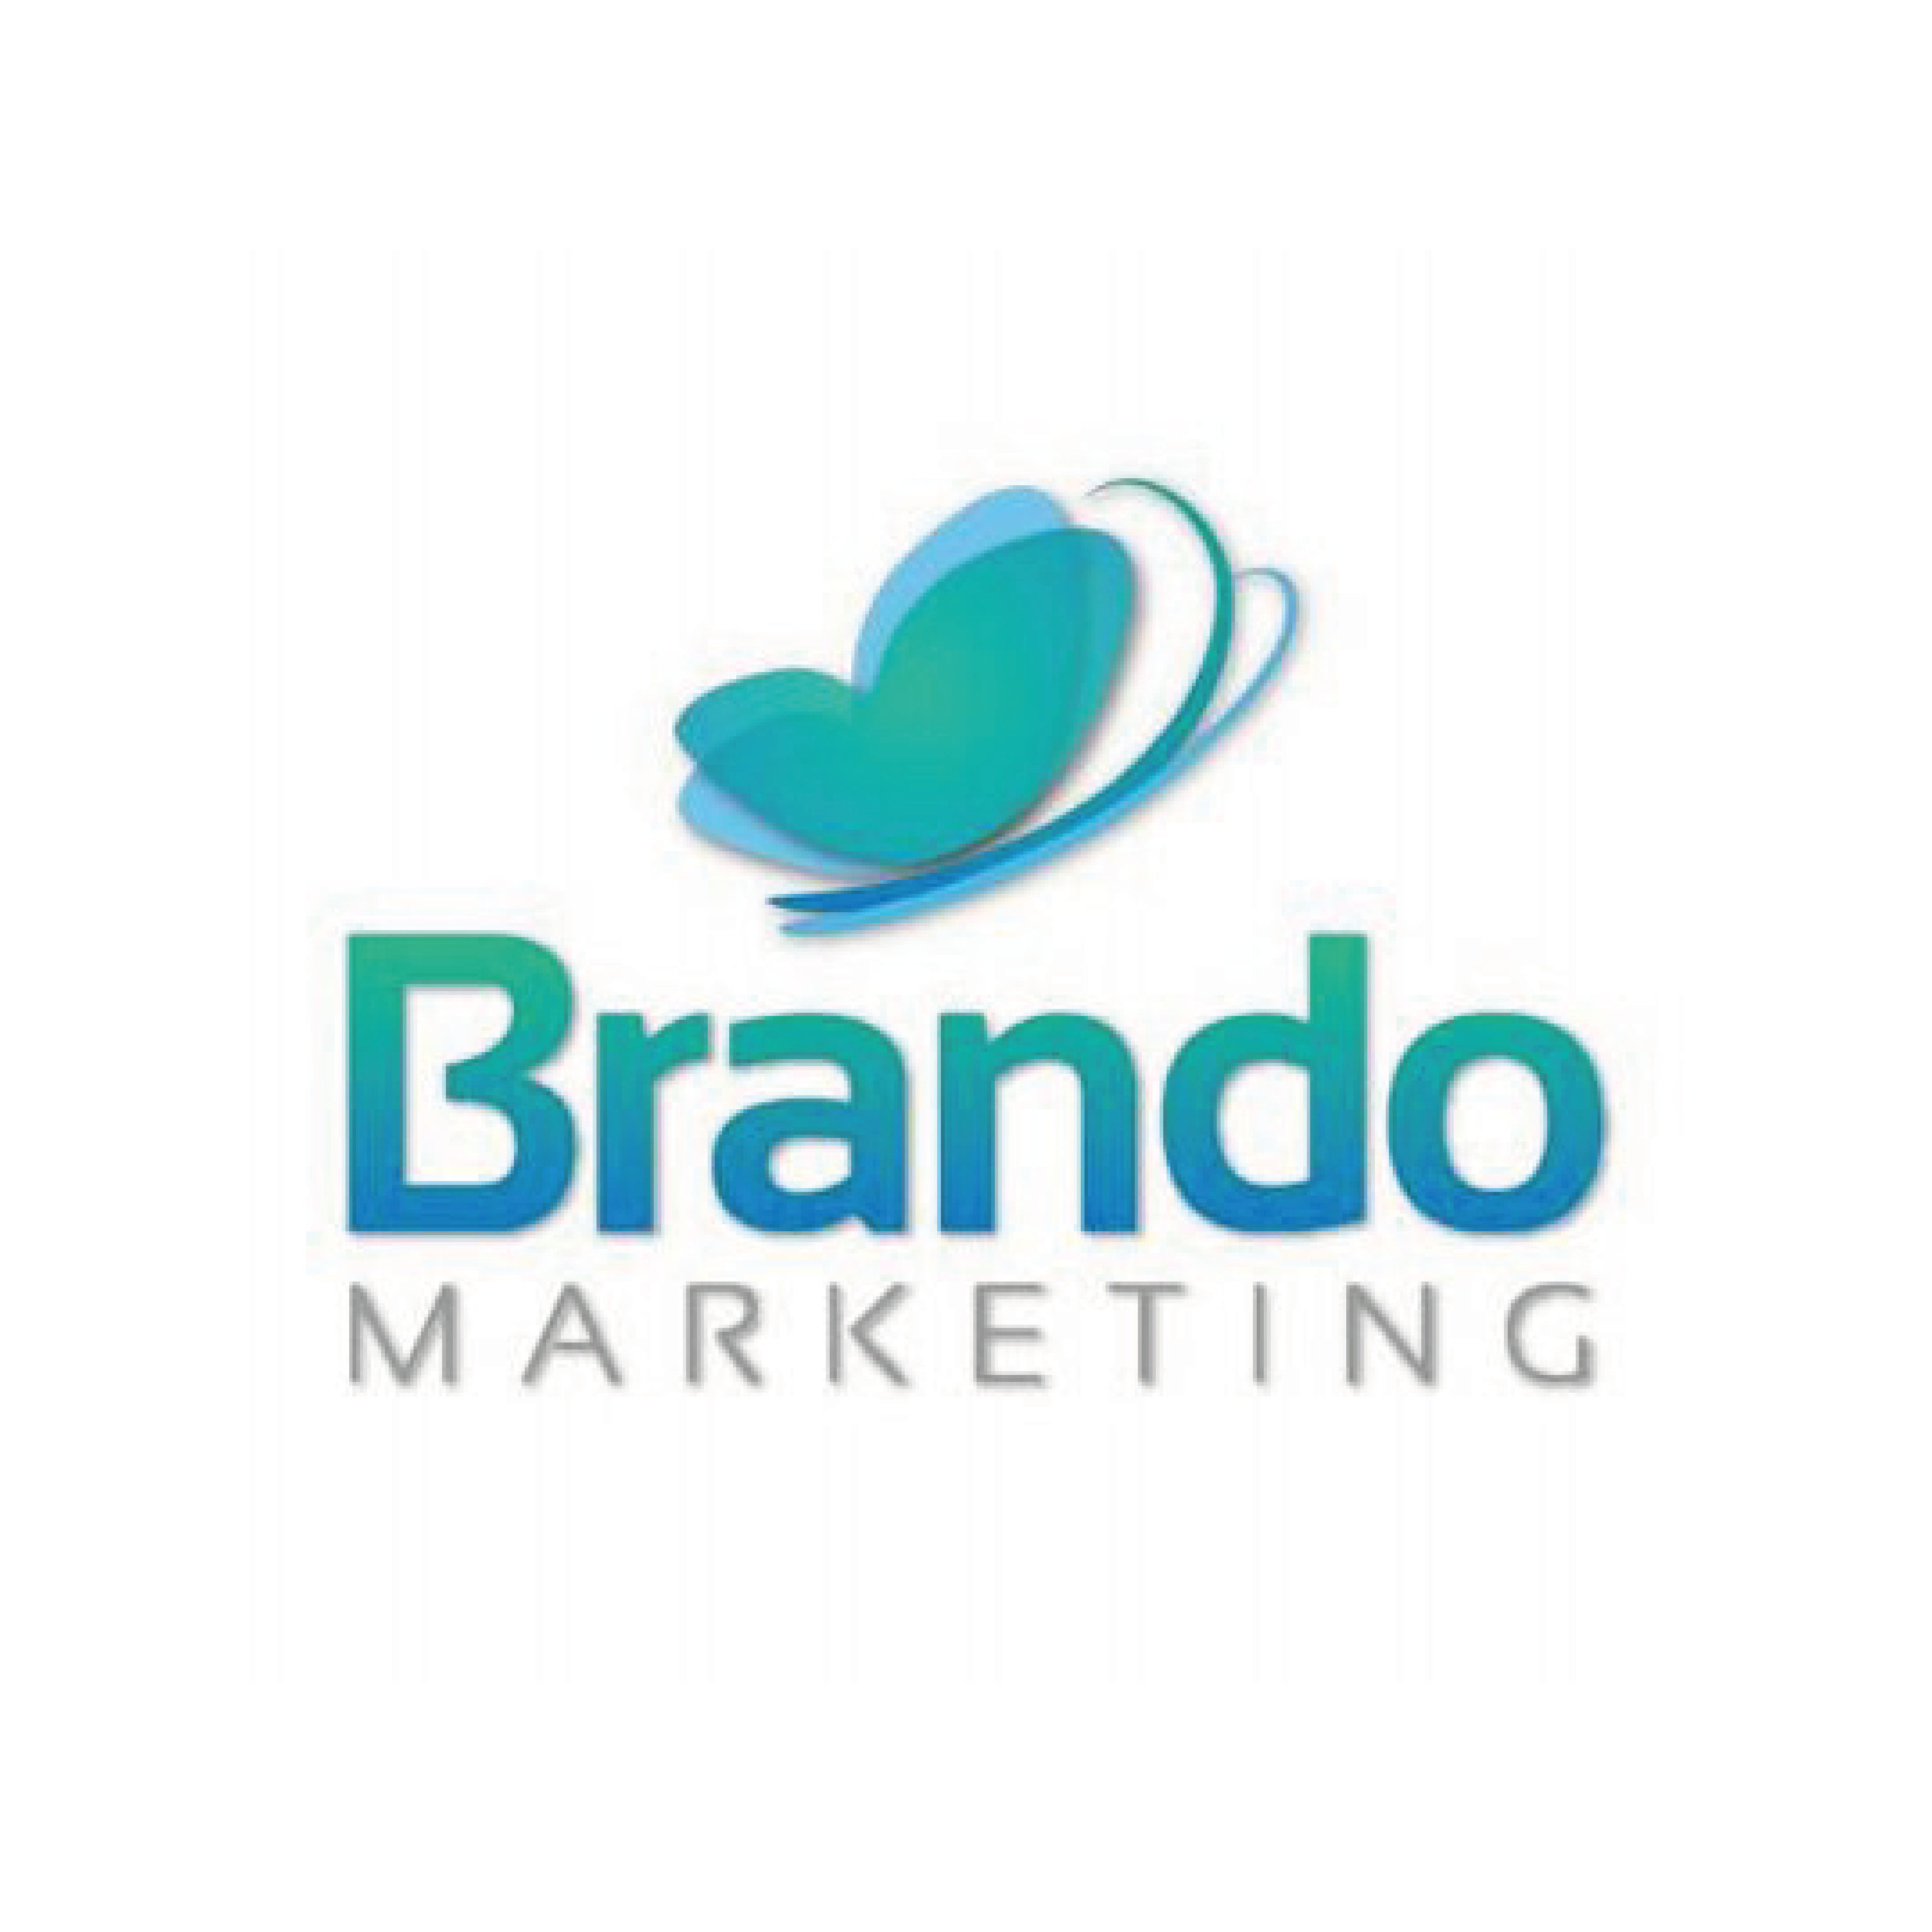 Brando Marketing